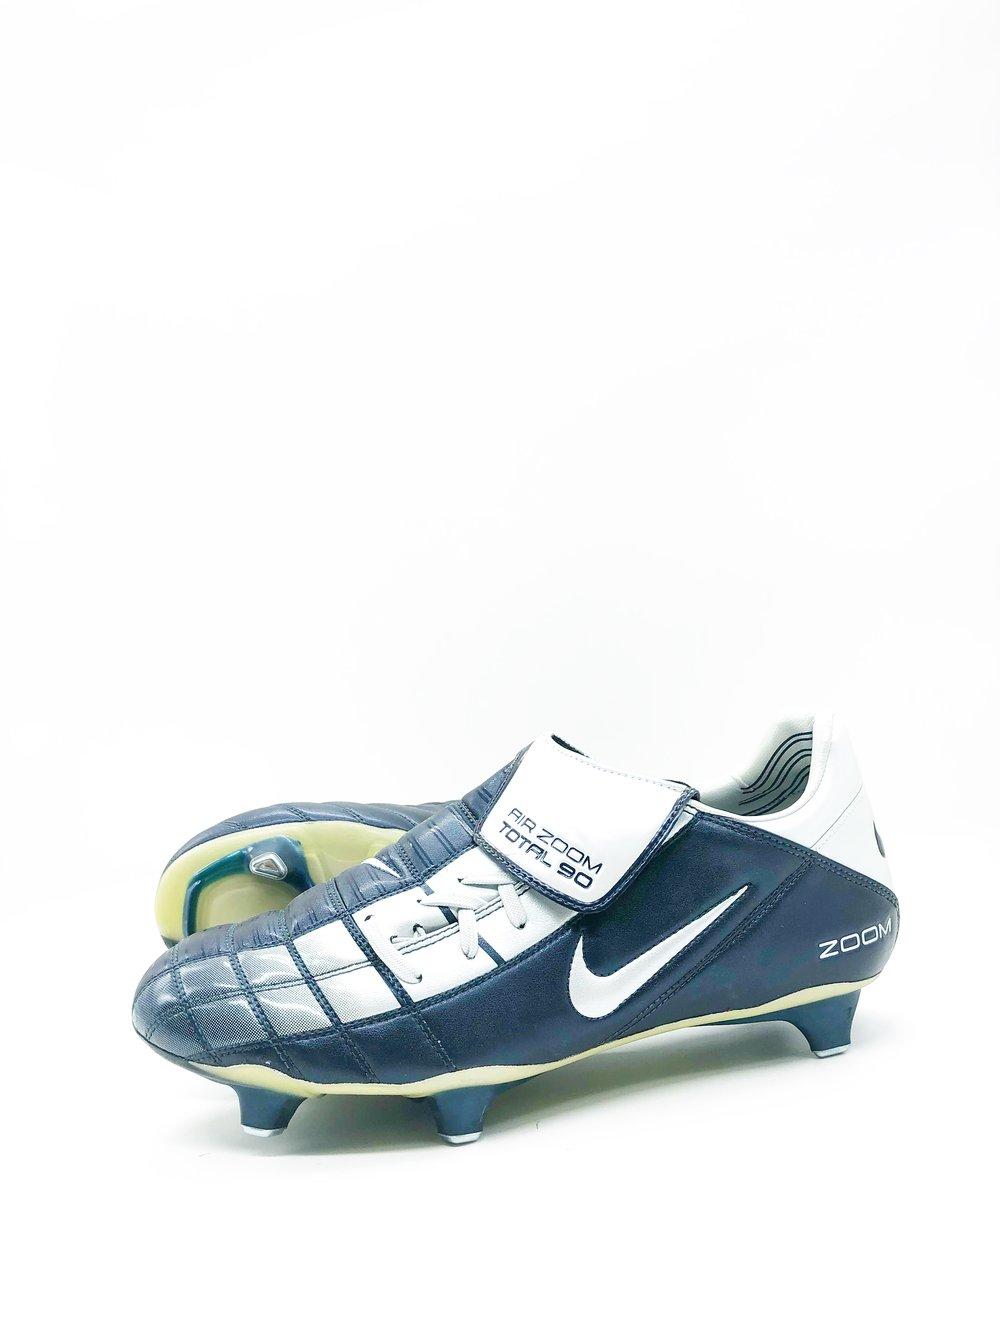 Image of Nike Total 90 air zoom SG grey